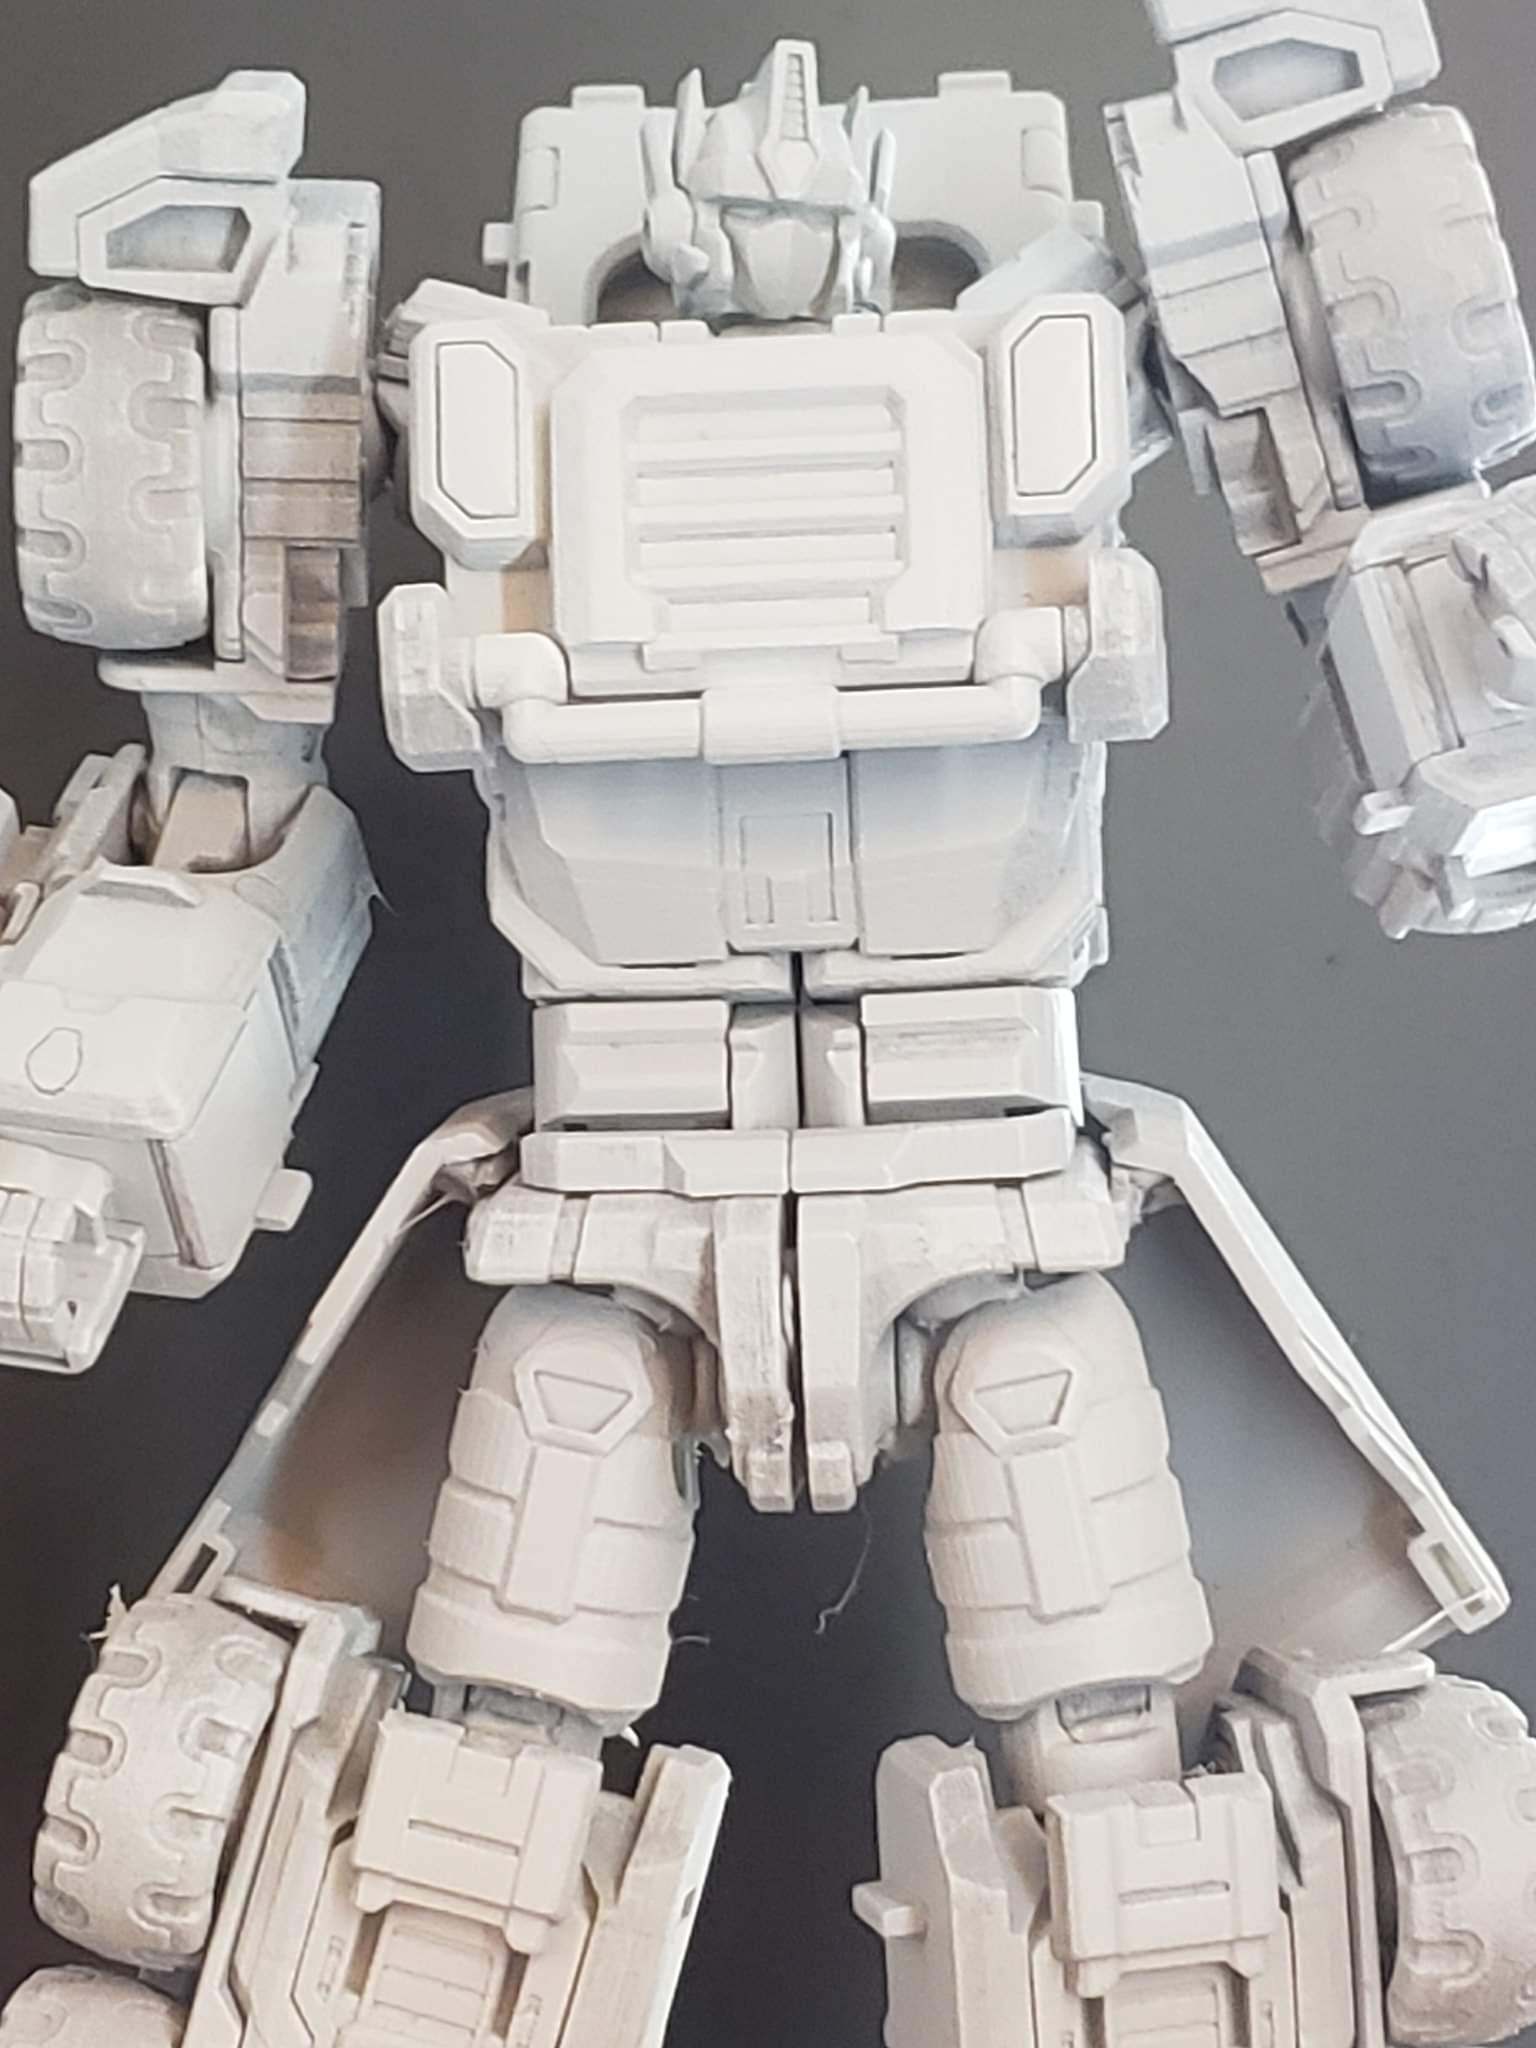 [FansHobby] Produit Tiers - Master Builder MB-15, MB-xx et MB-xx - aka Armada Optimus Prime, Jetfire et Overload FoqM6MsW_o